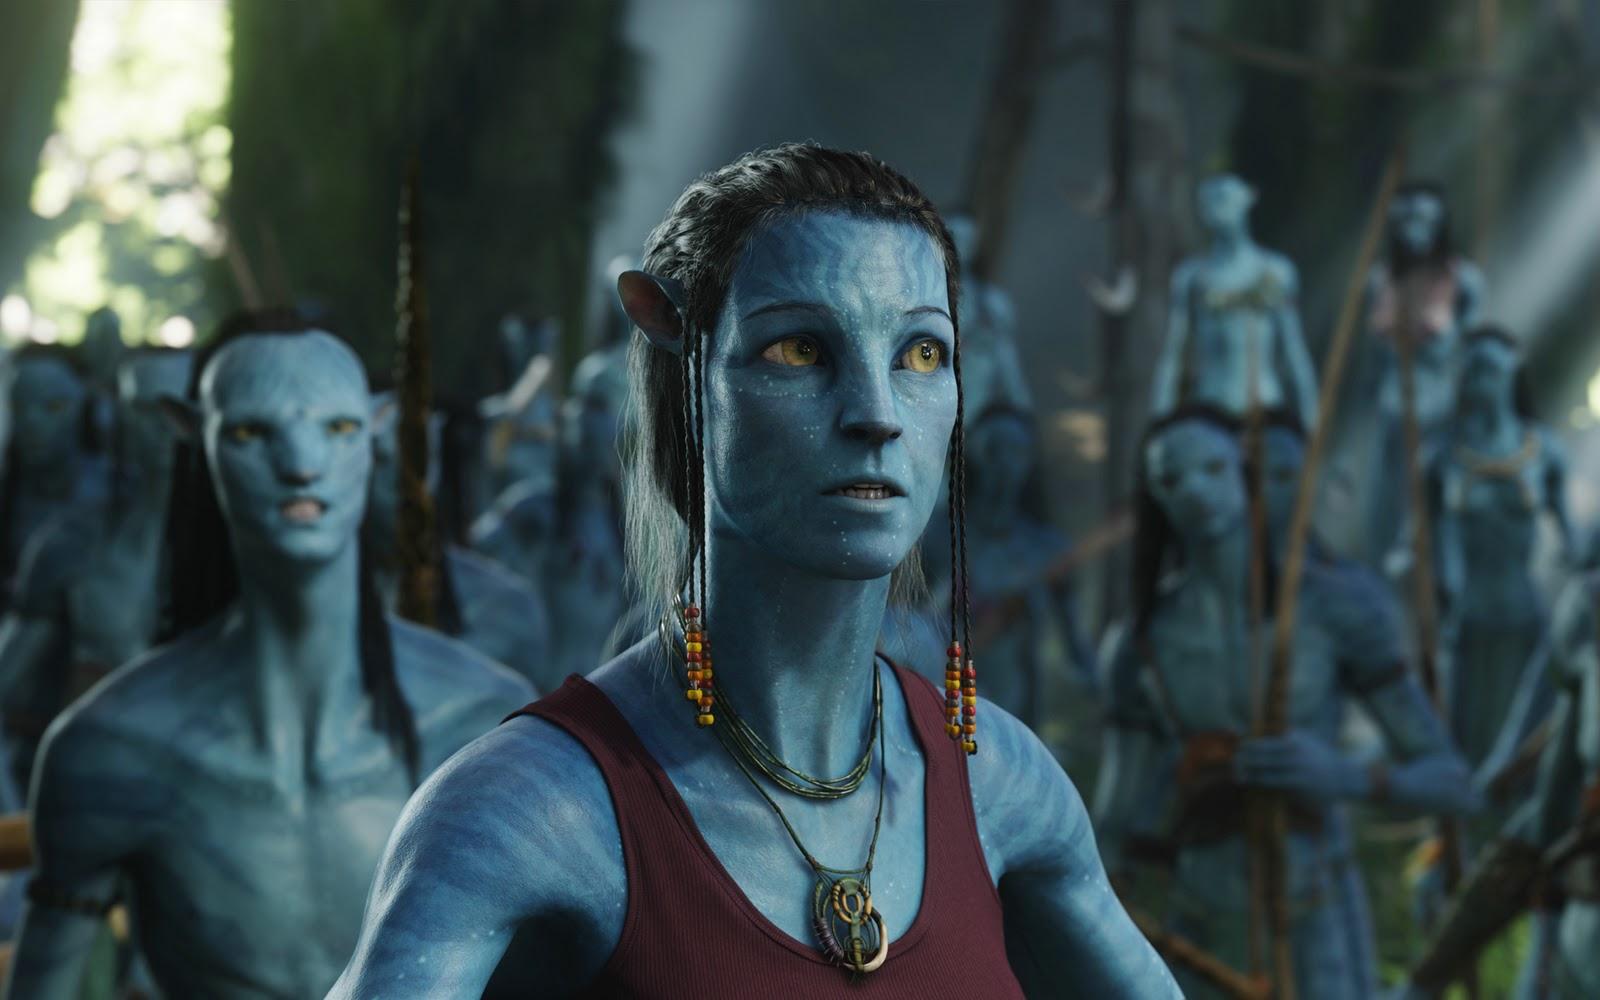 Human Vs Navi Battle Pandora Avatar 7 Themes  - human vs navi battle pandora avatar wallpapers